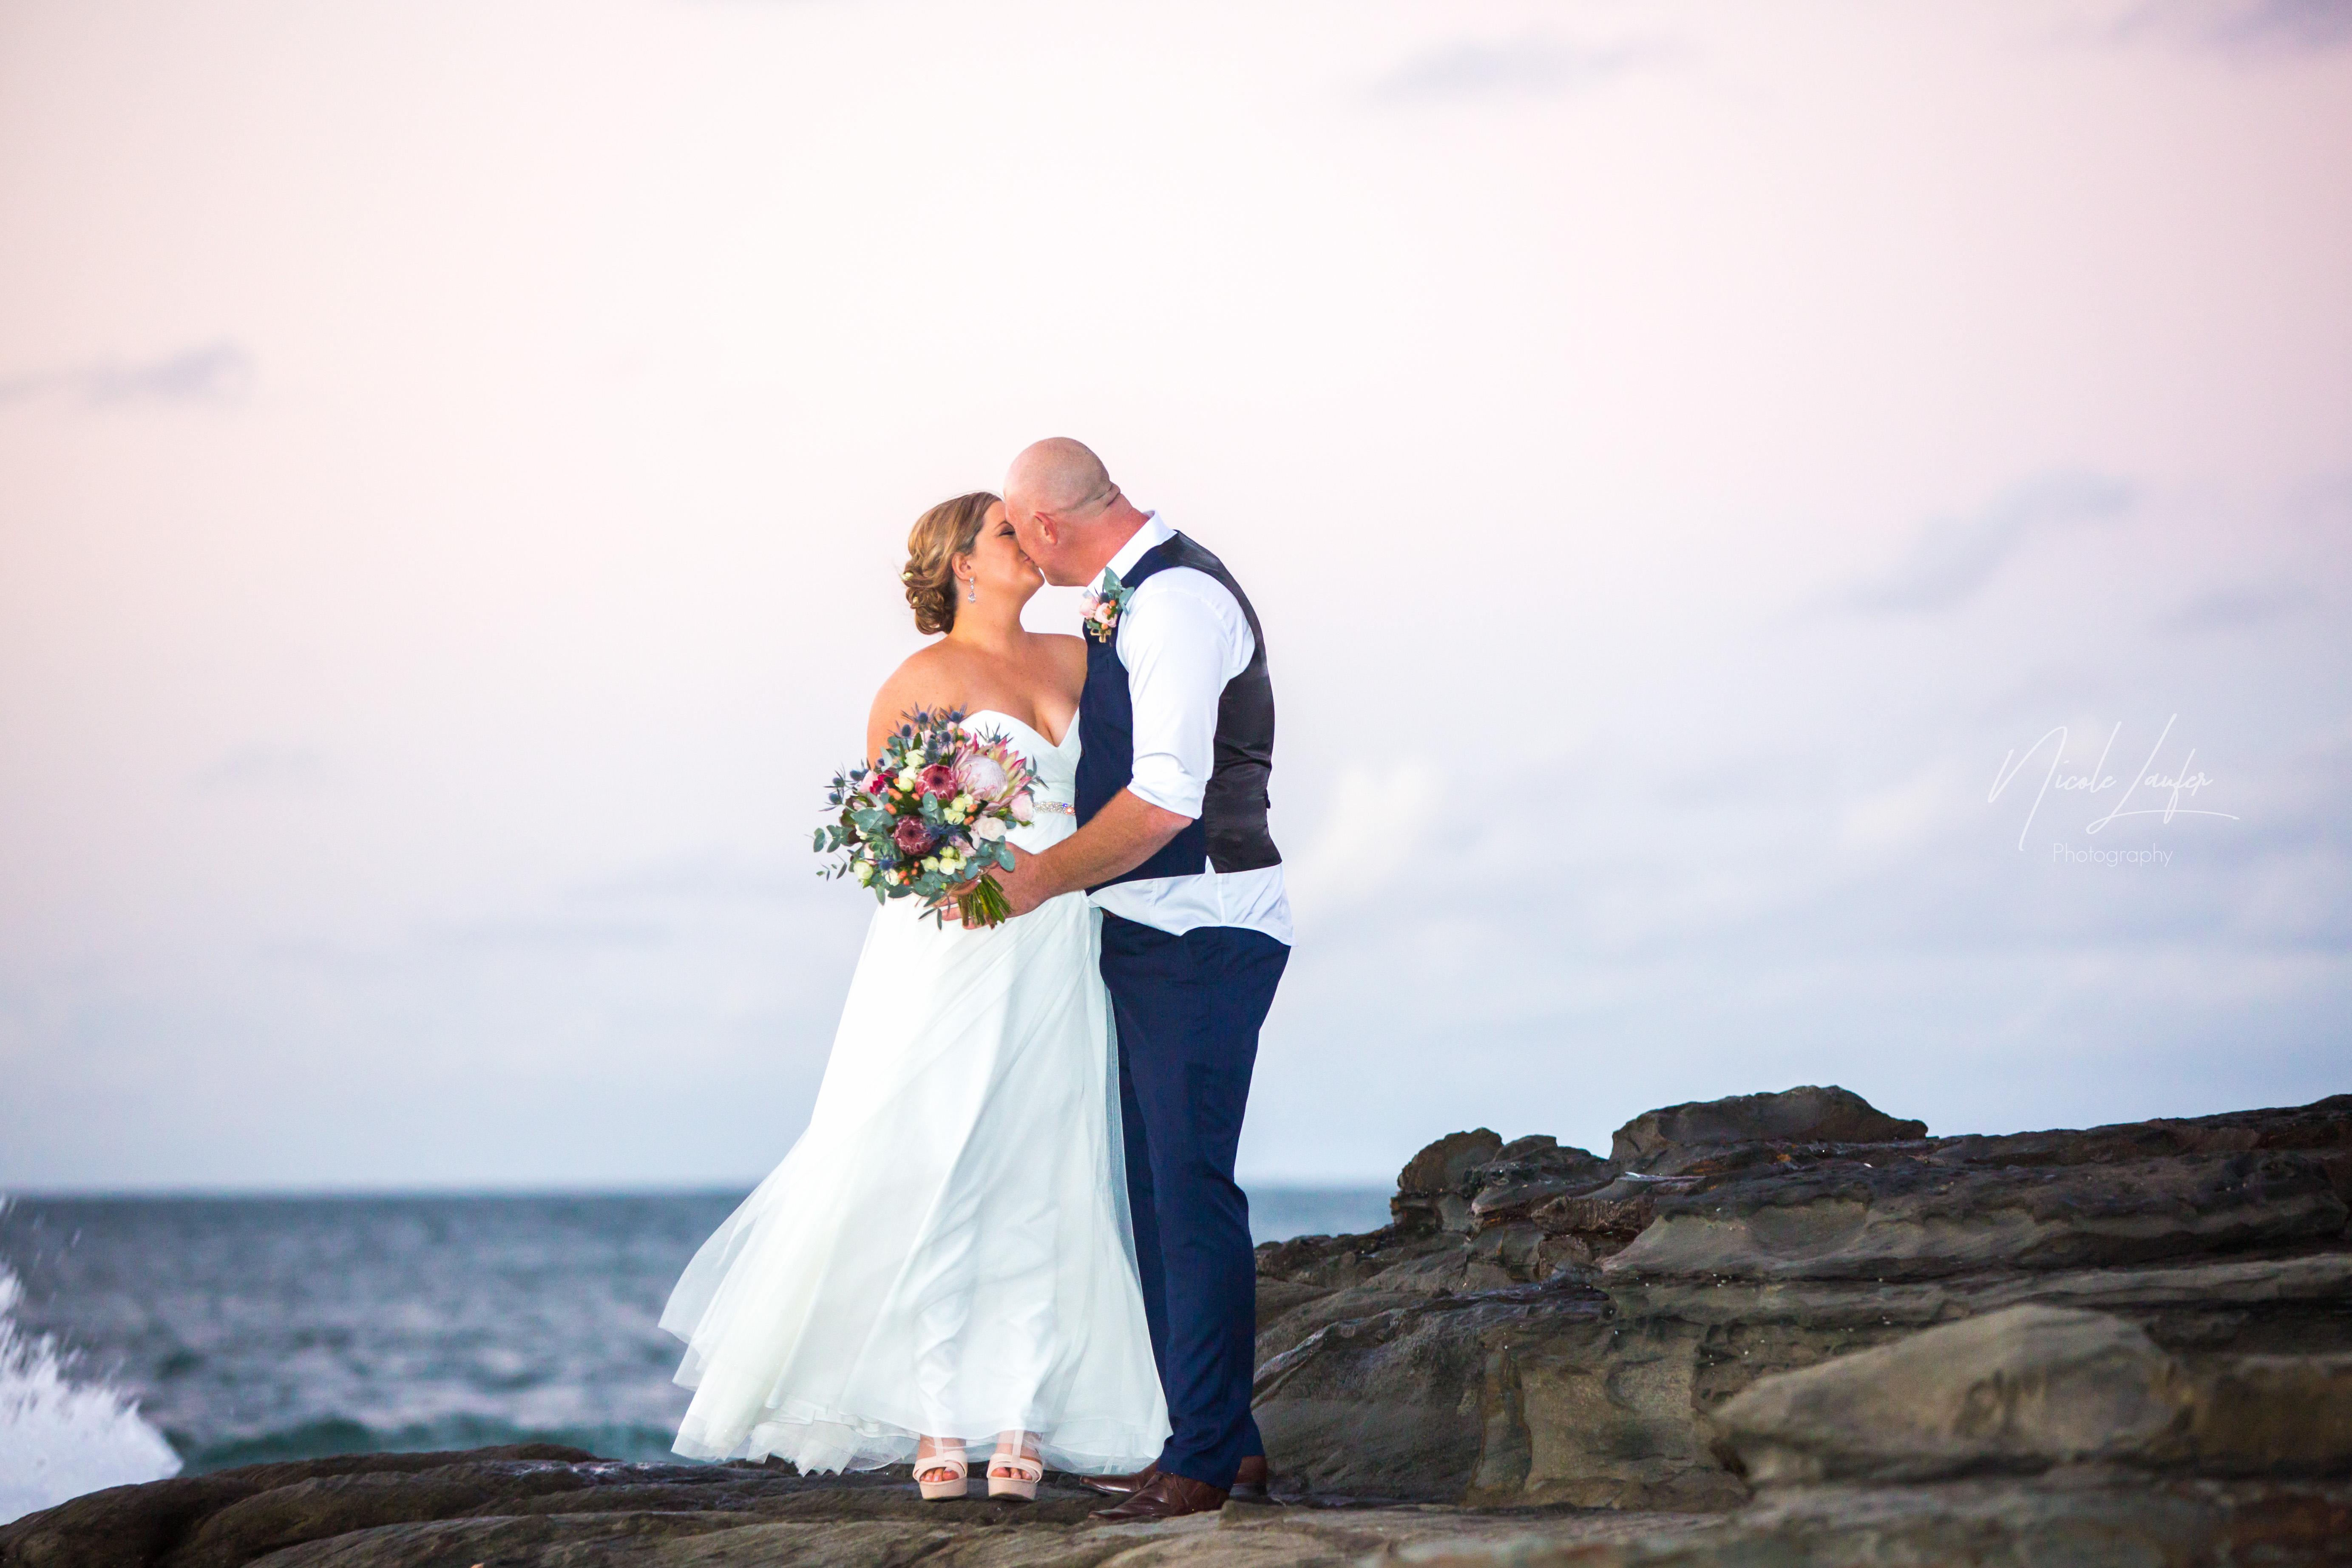 Mooloolaba wedding photography